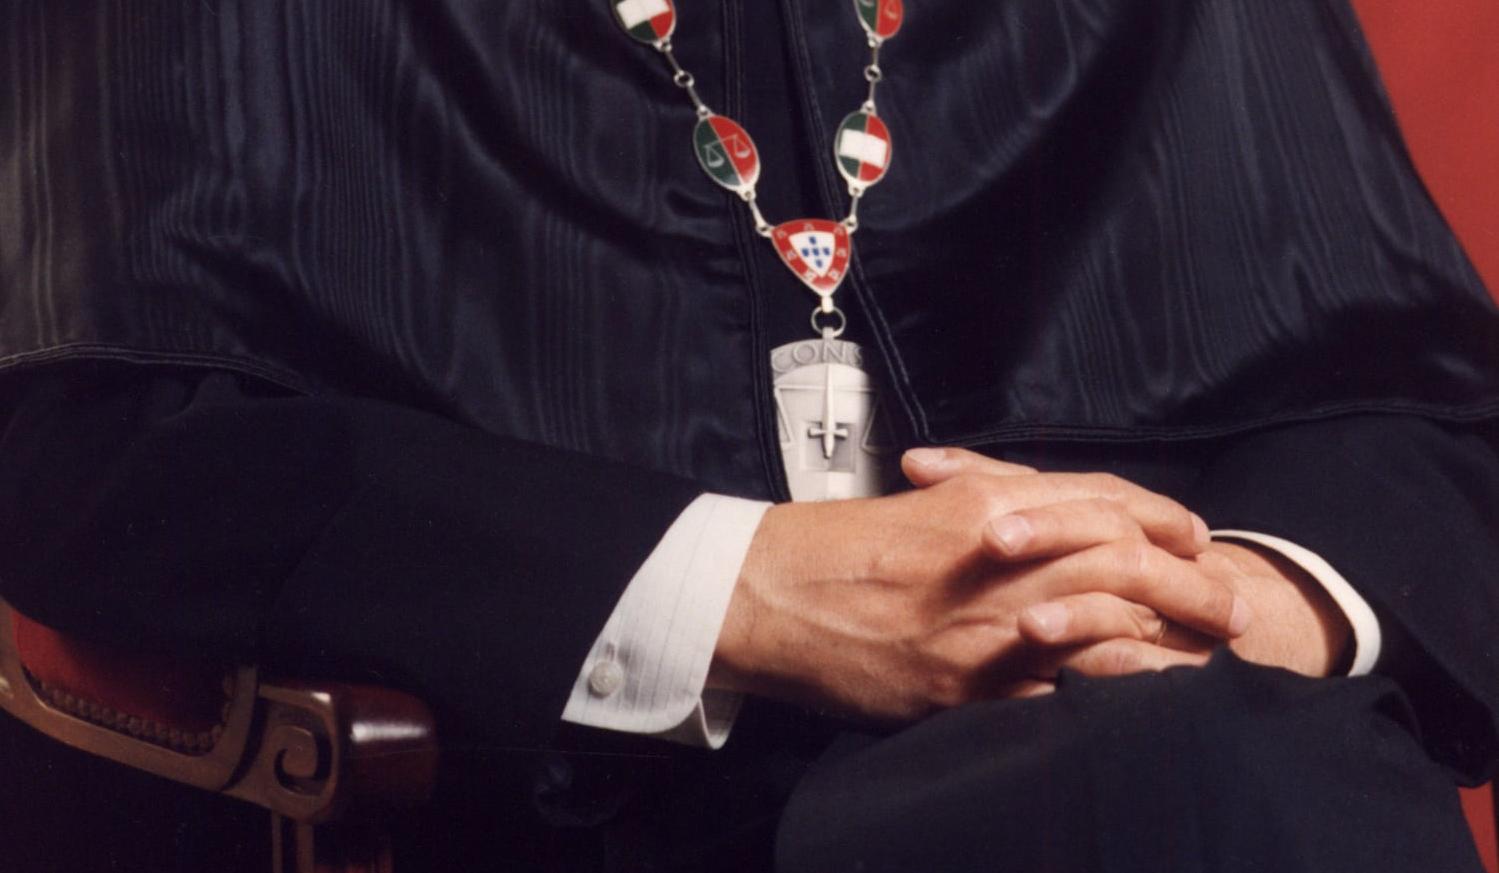 Encontro de juízes e futuros juízes na Casa do Juiz – 02/07/2021